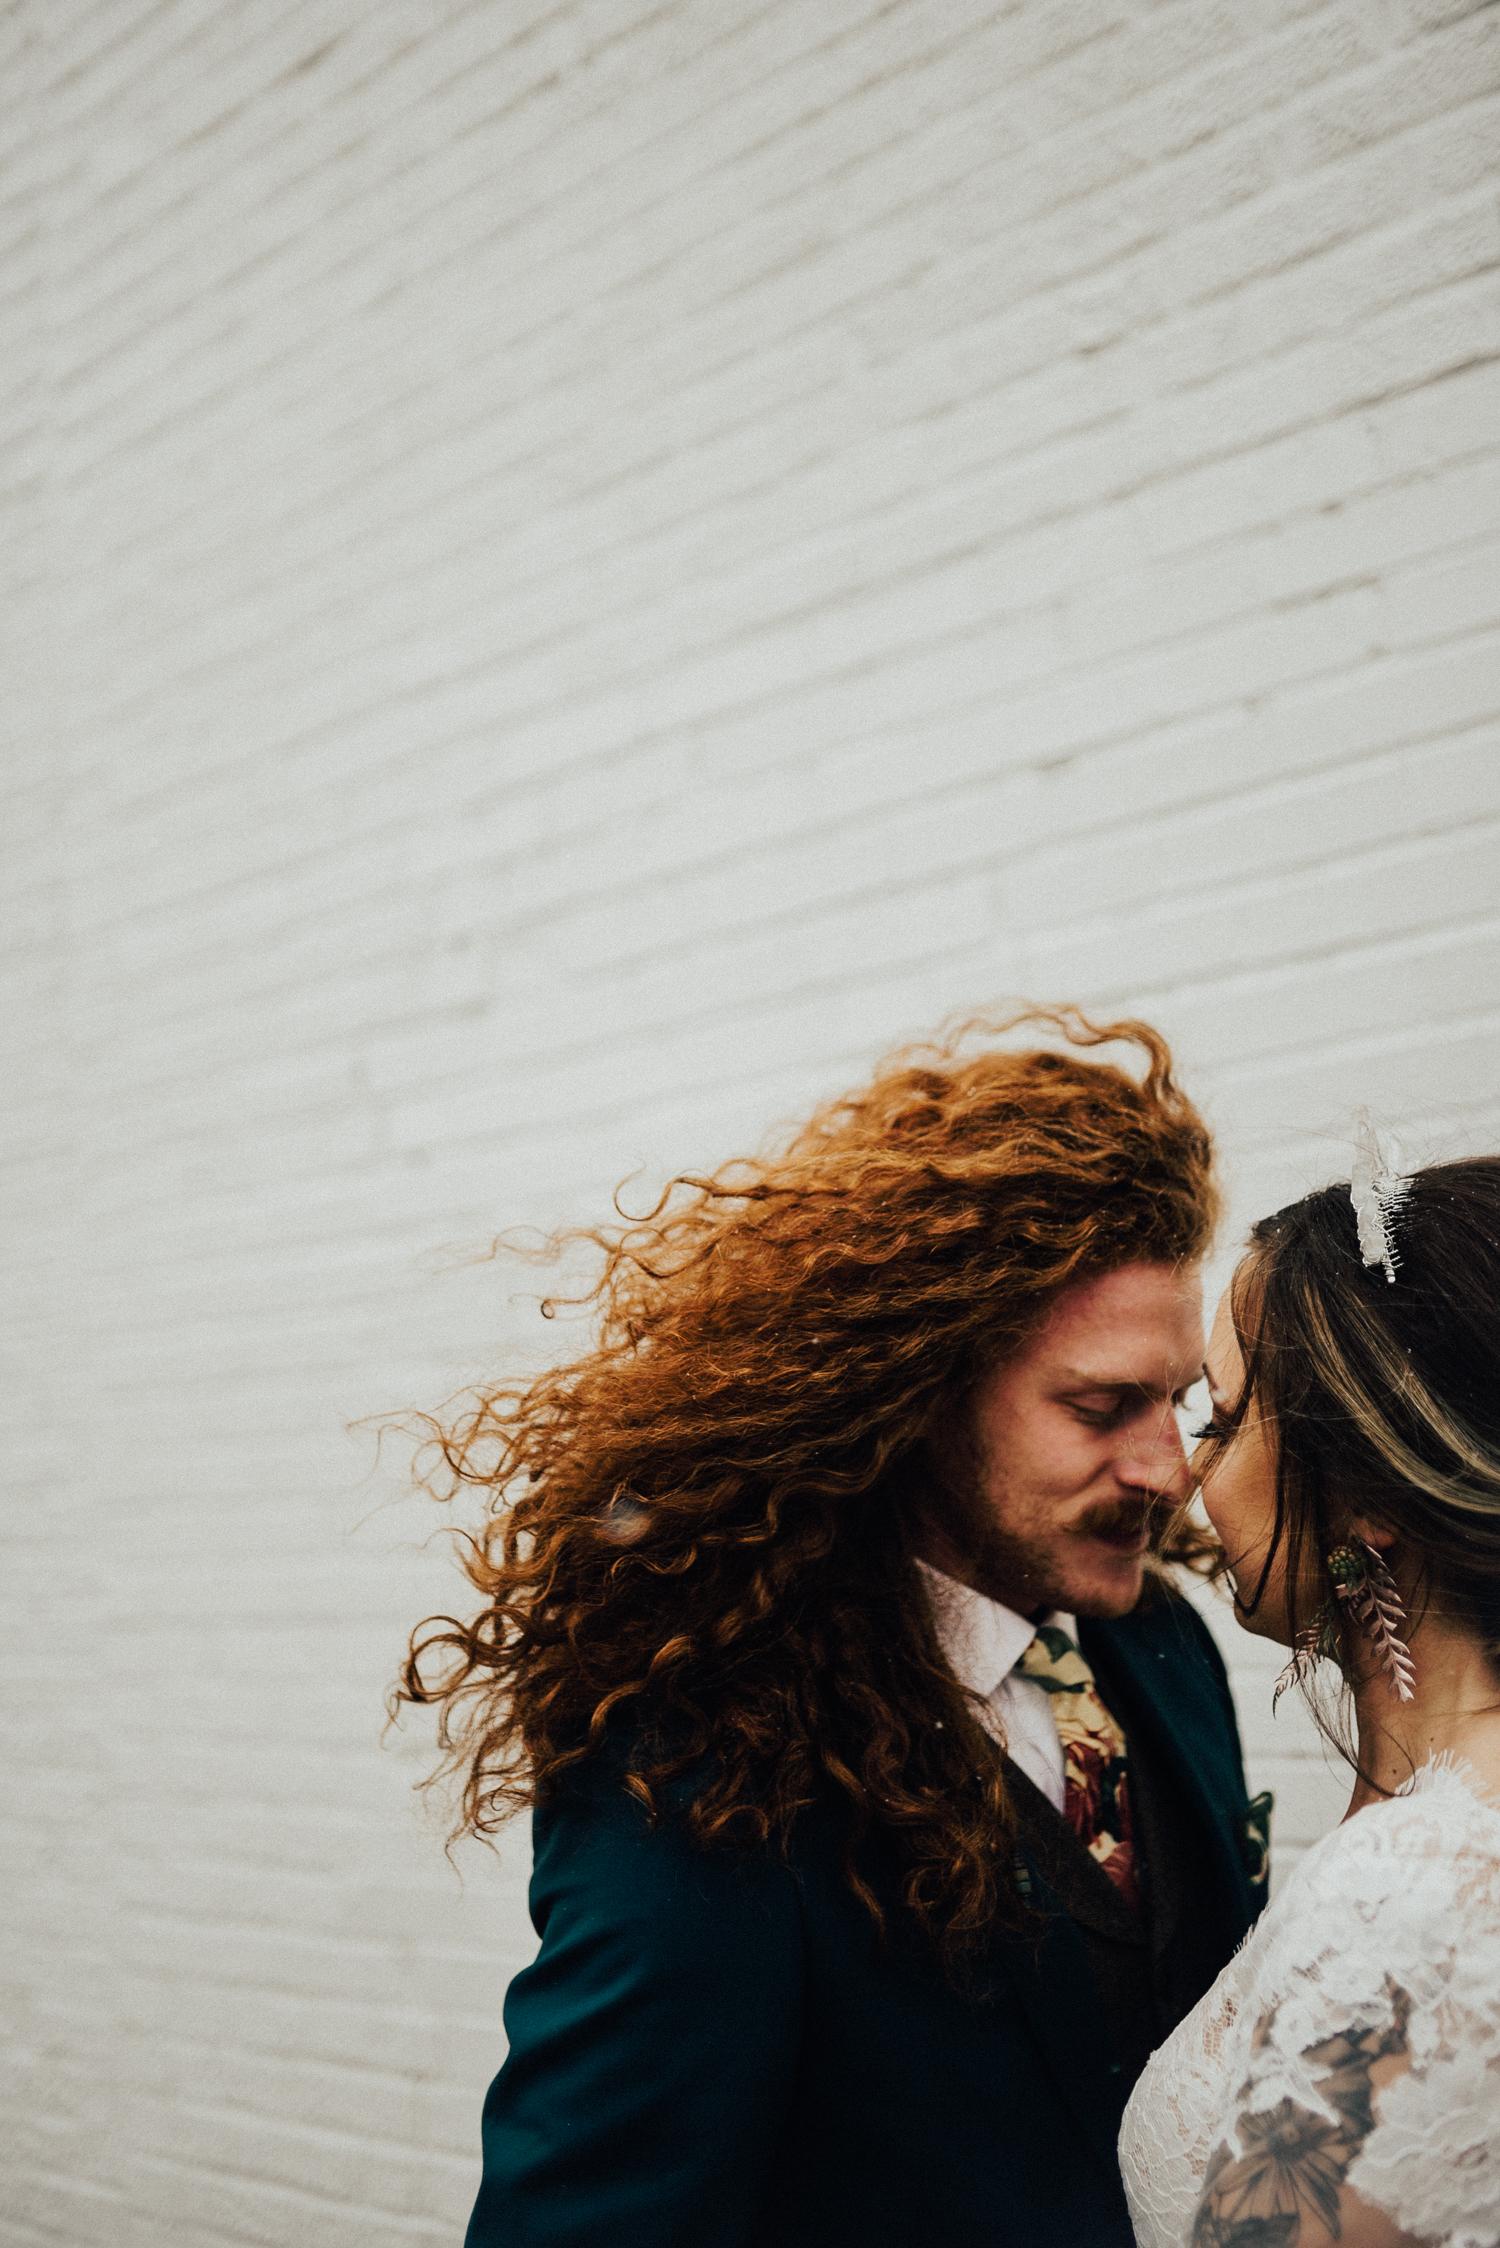 St-Louis-wedding-photographers-77.jpg